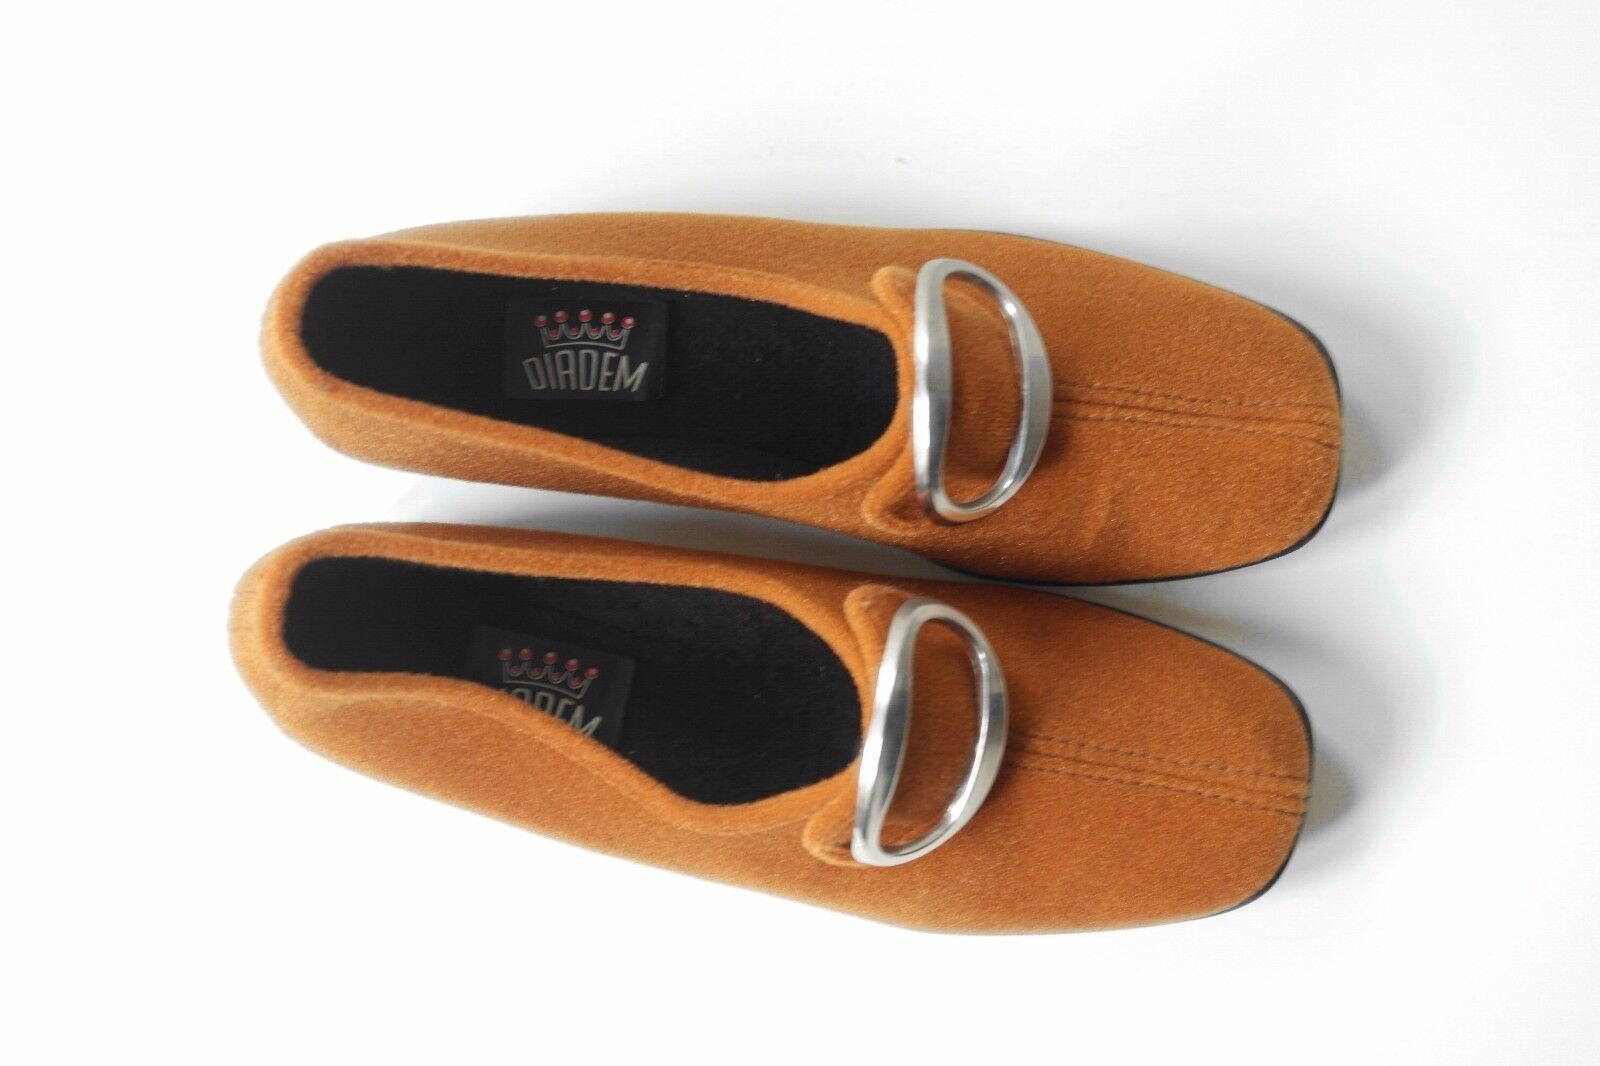 DIADEM Topas Damen Halbschuhe 60er TRUE VINTAGE Schuhe 40 Slipper Loafer NOS EUR 40 Schuhe 2cf5eb